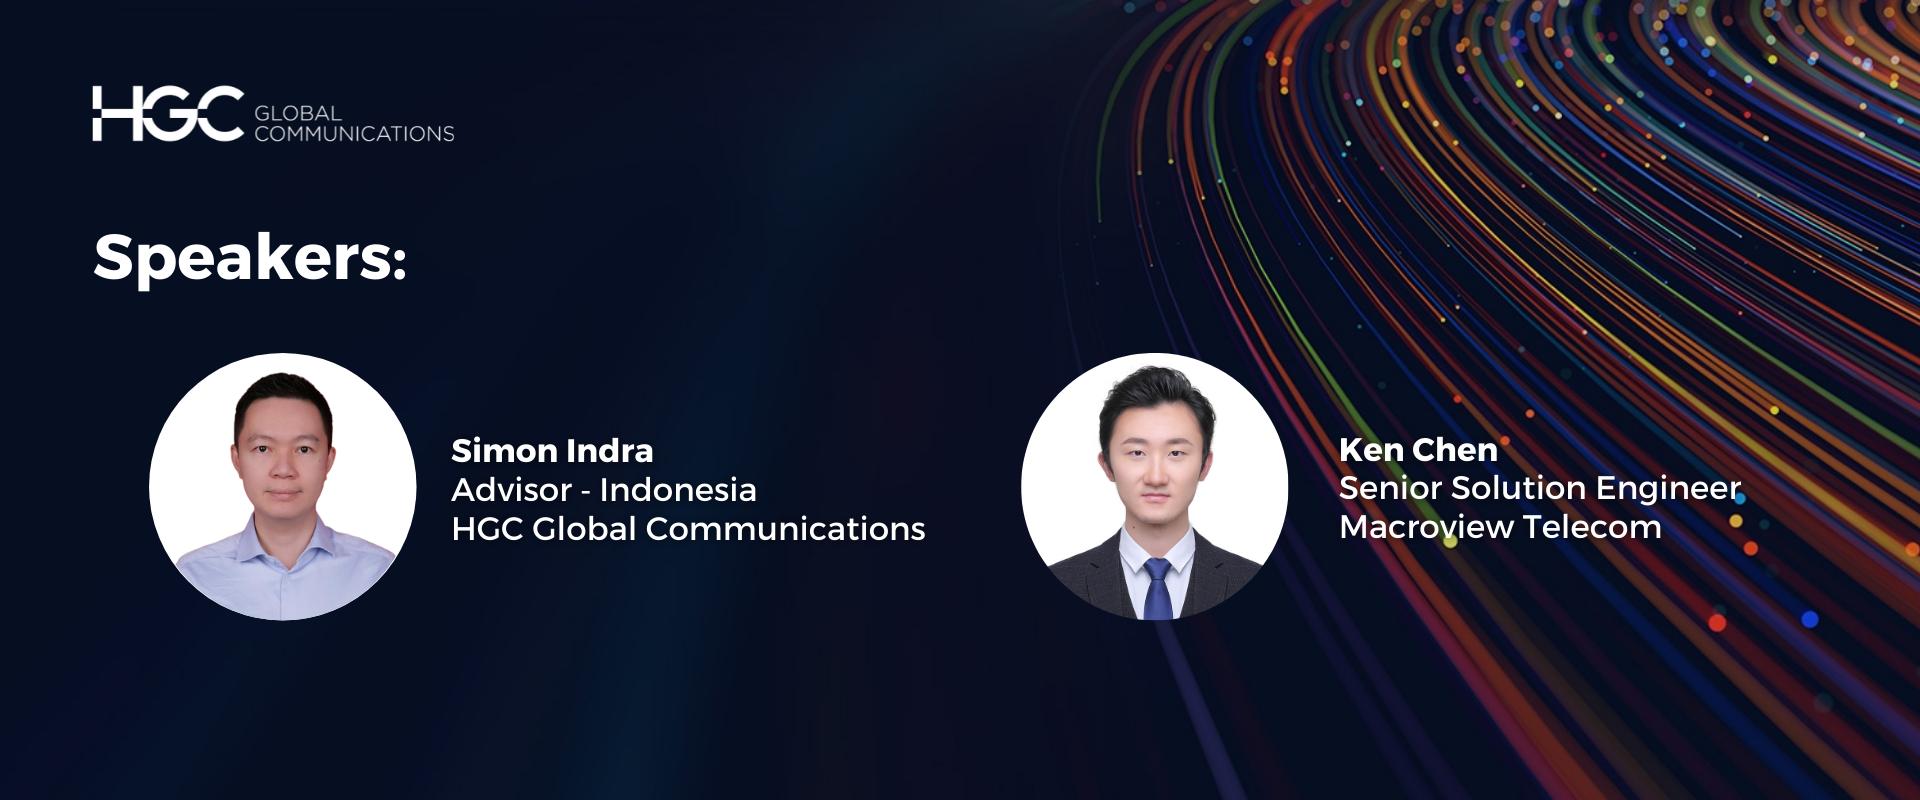 PT KOTA CERDAS INDONESIA